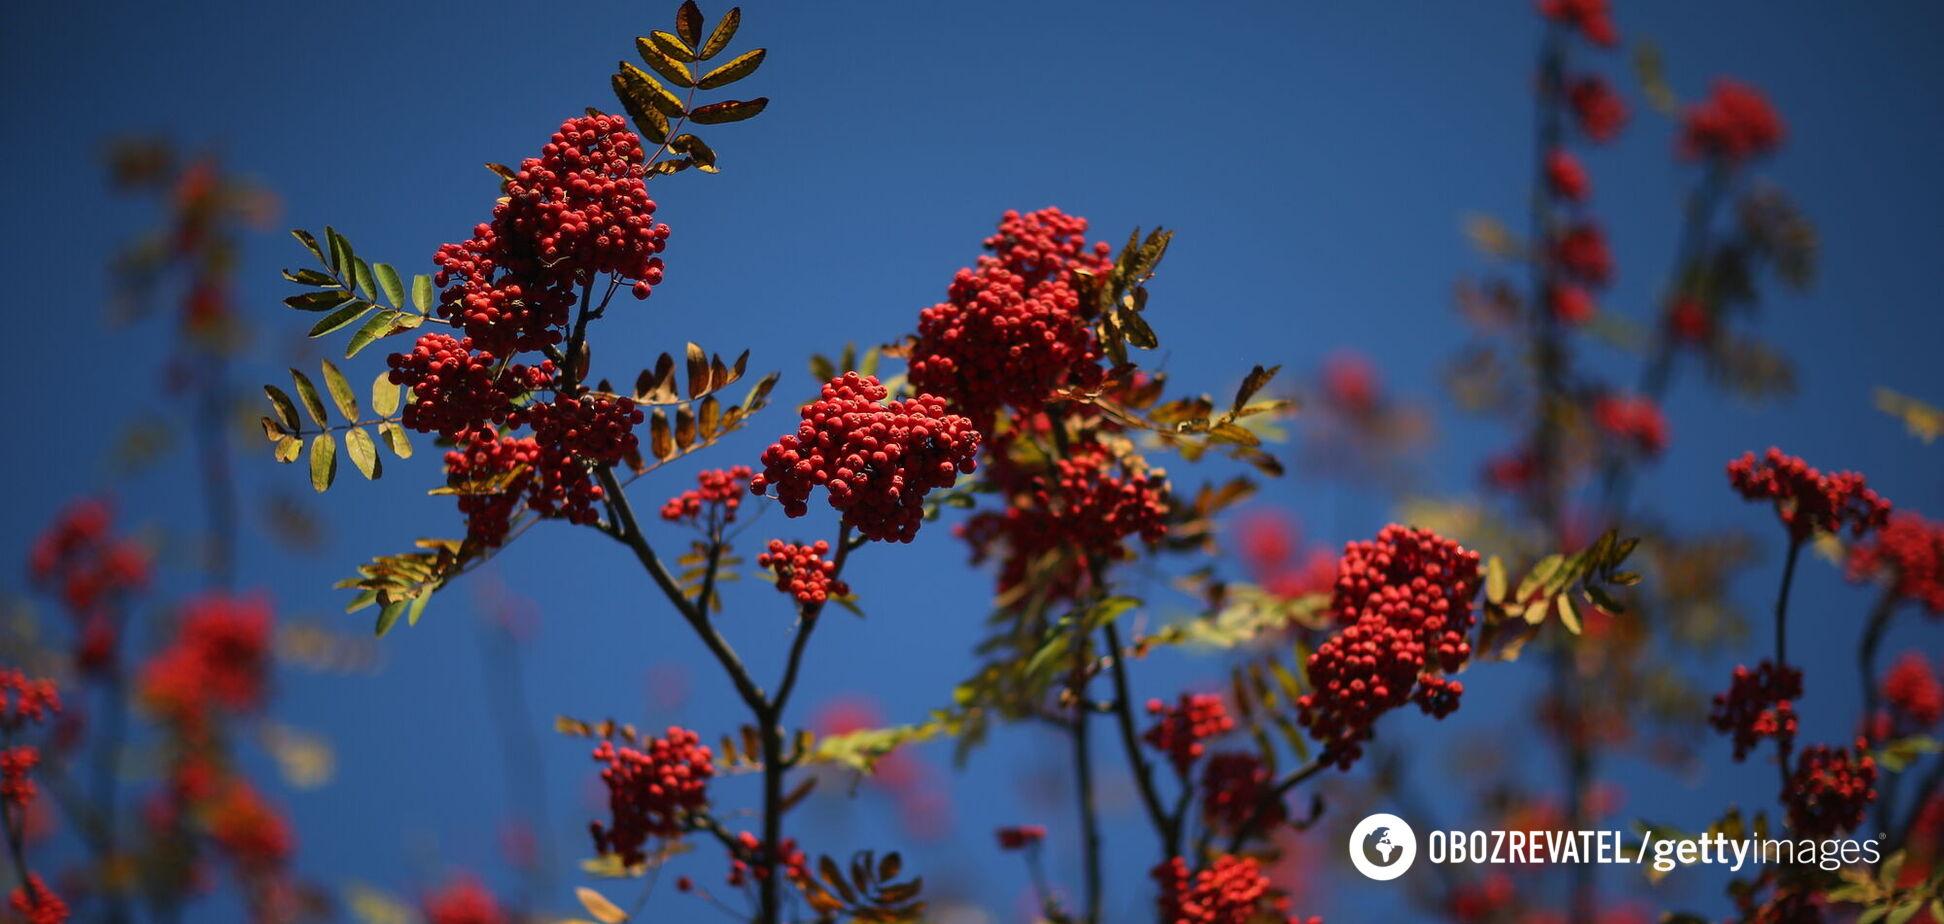 Половина сентября в Украине будет летней: синоптик дал прогноз на начало осени